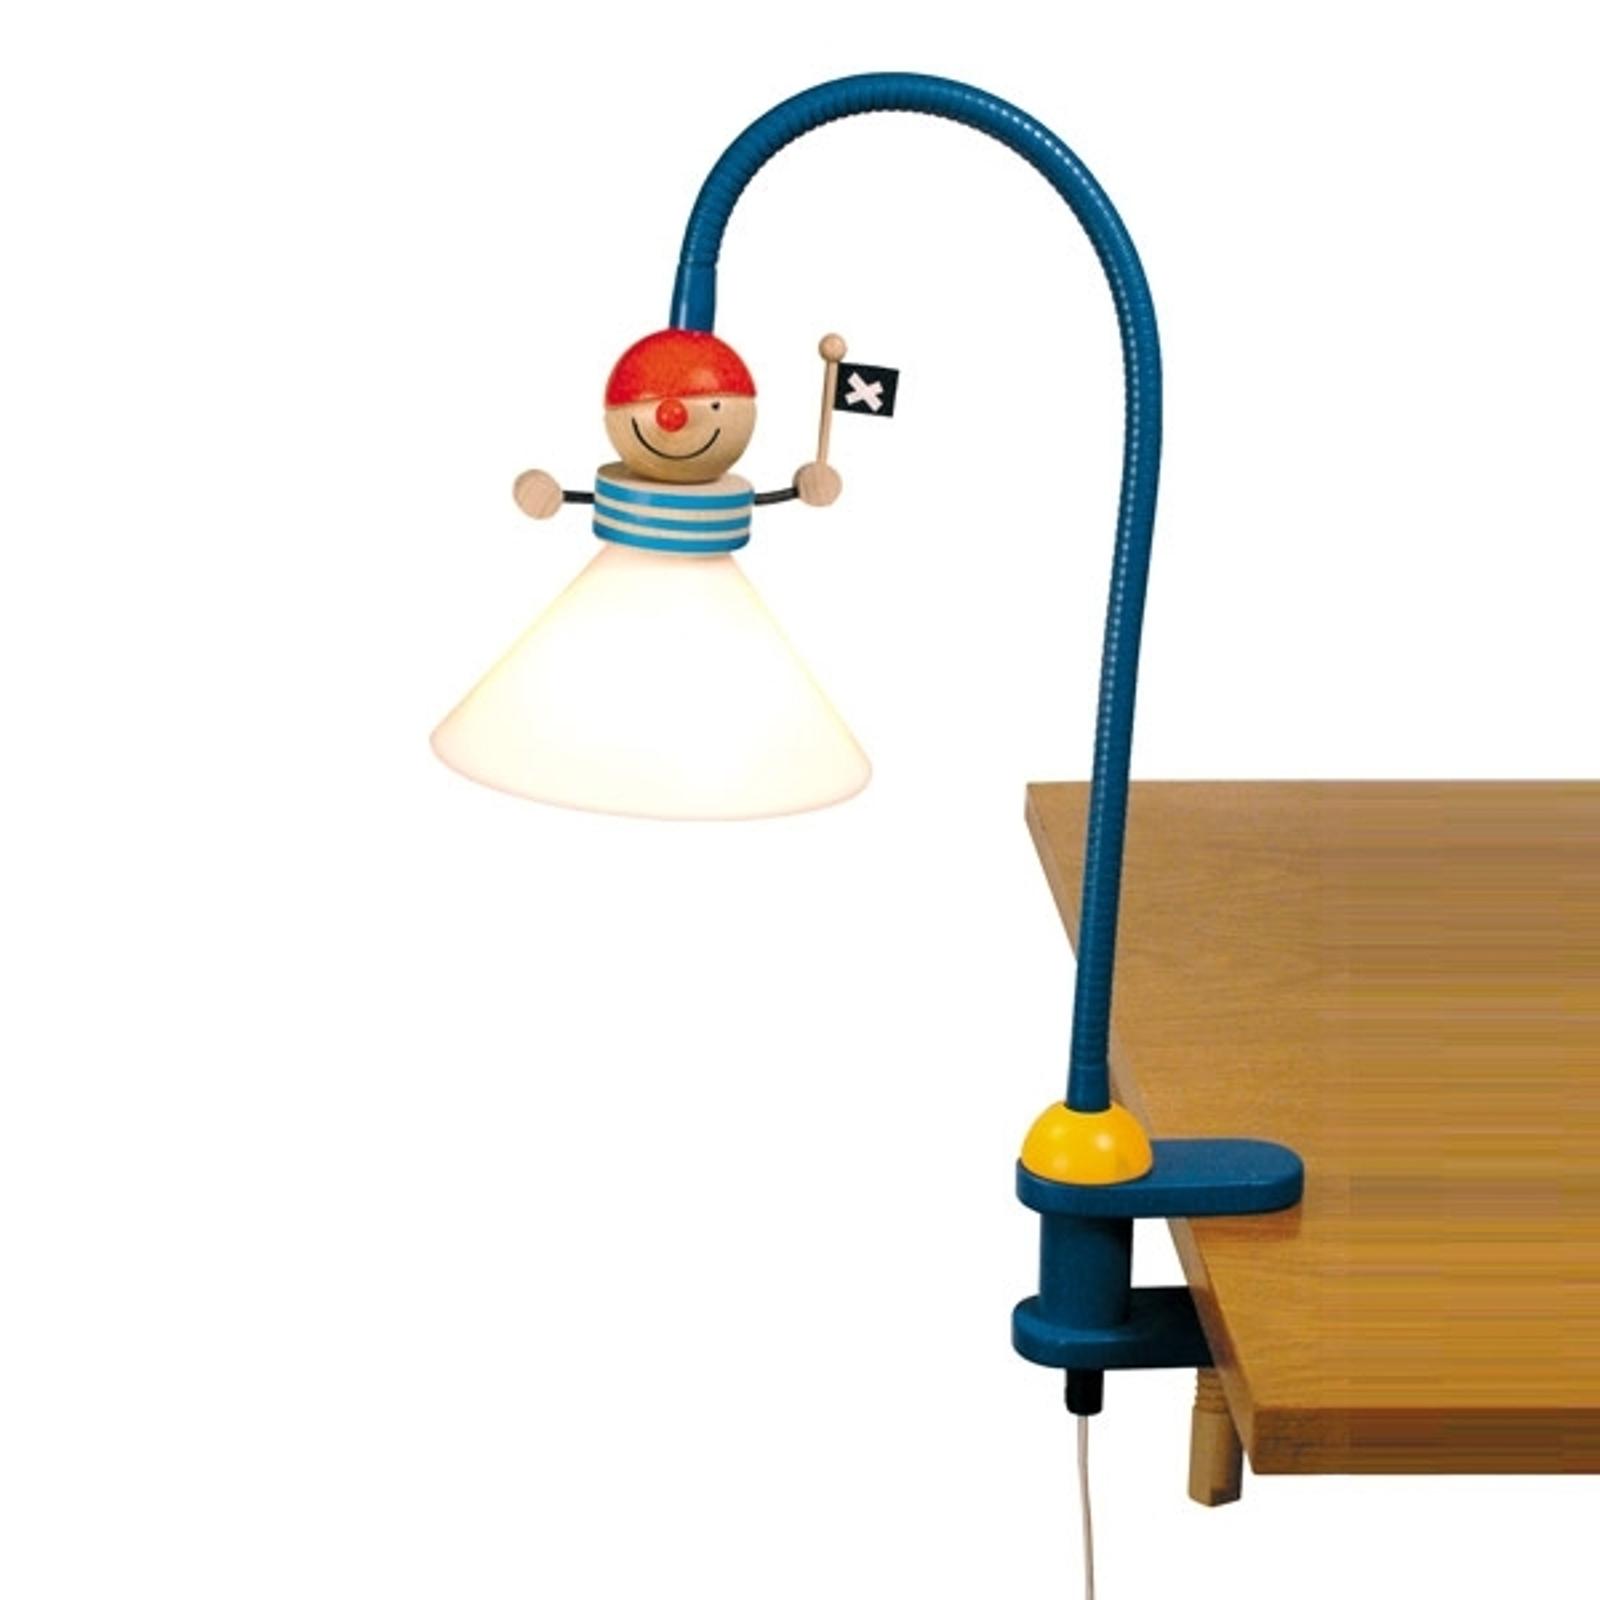 Pirate Clamp Light_5400112_1